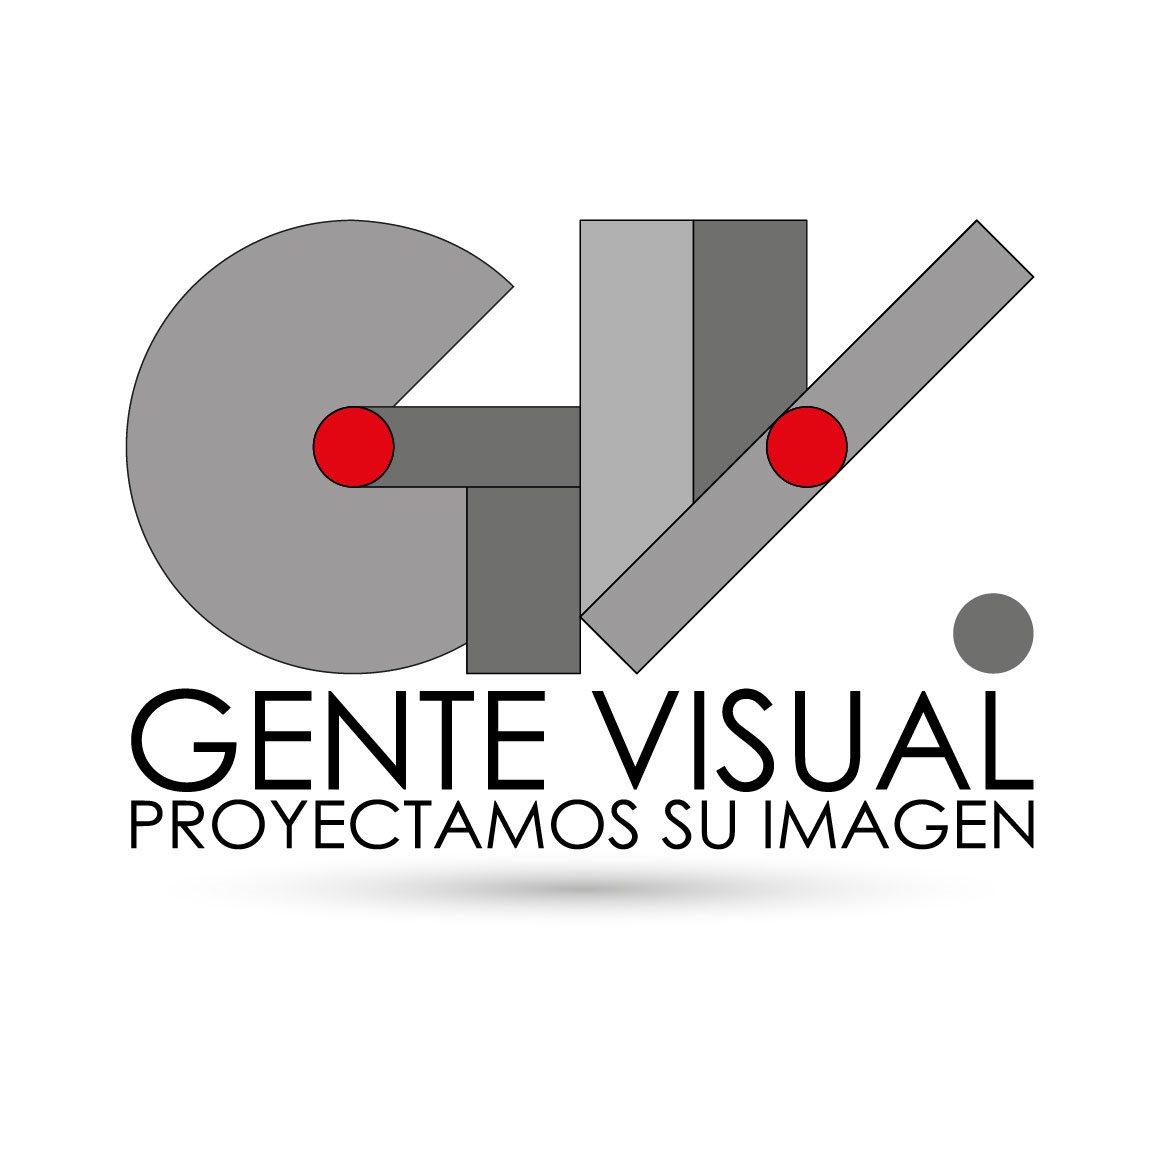 GENTE VISUAL PUBLICITARIA S.A.S